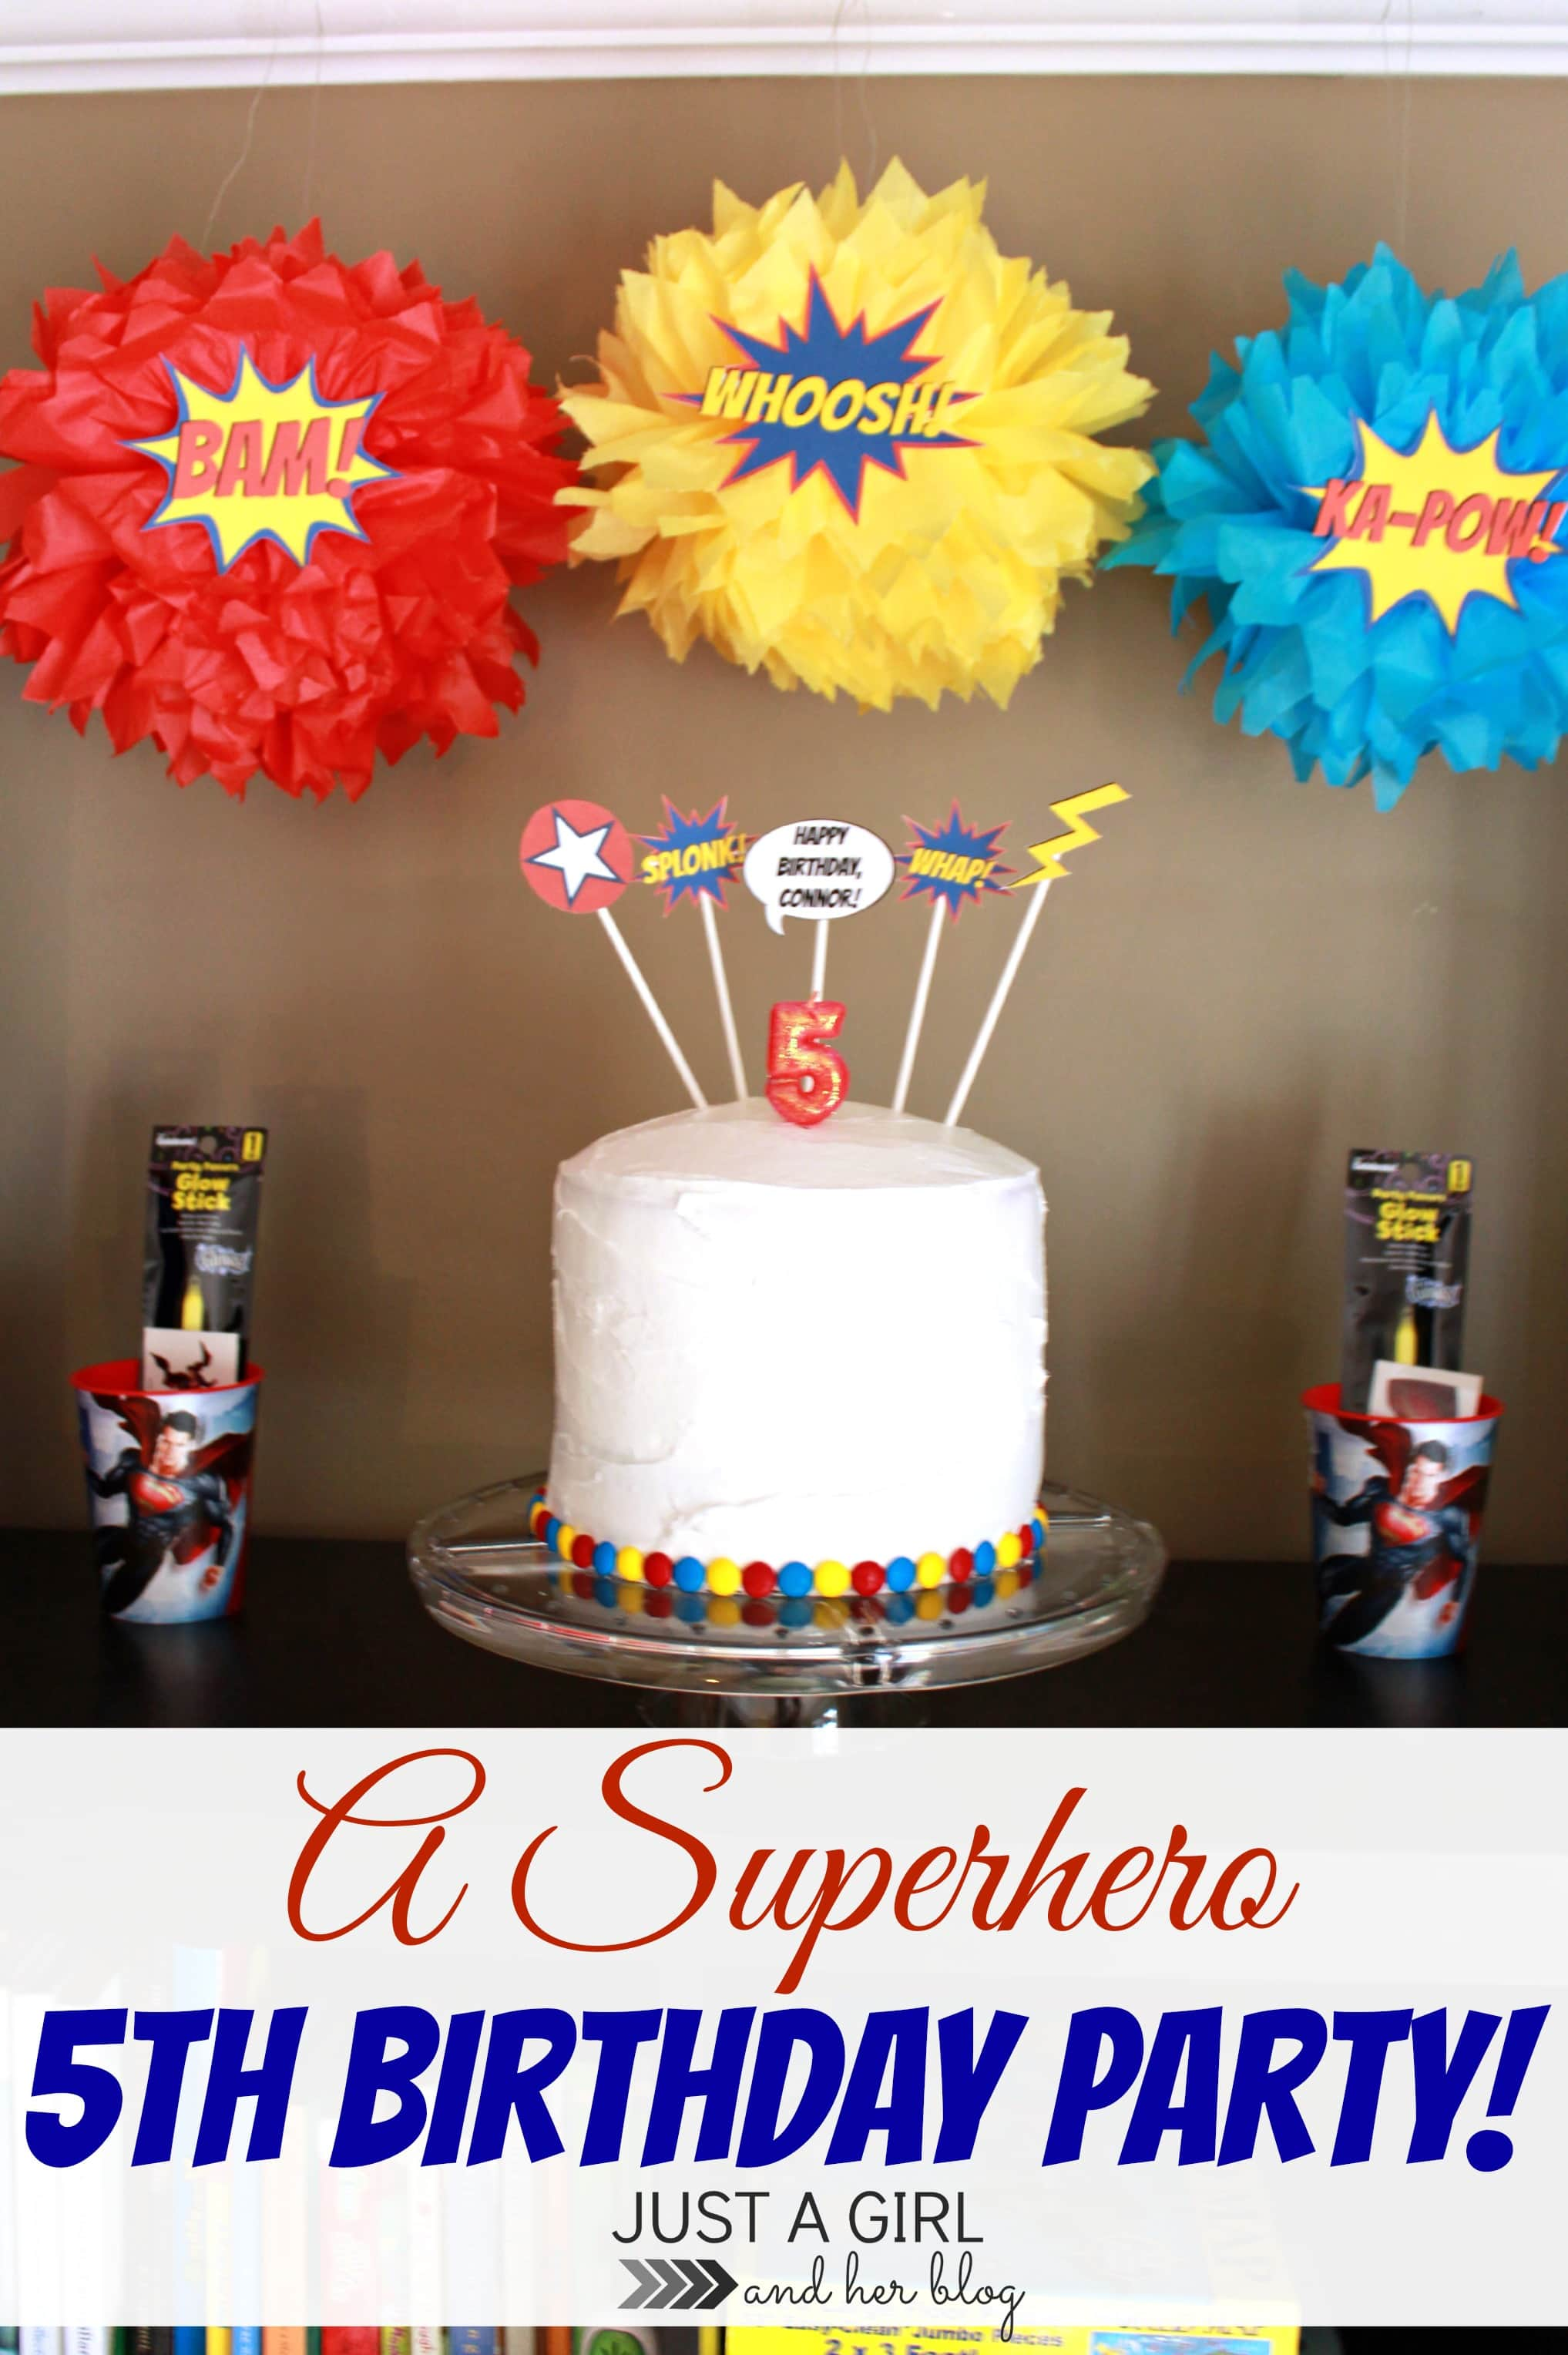 A Superhero 5th Birthday Party